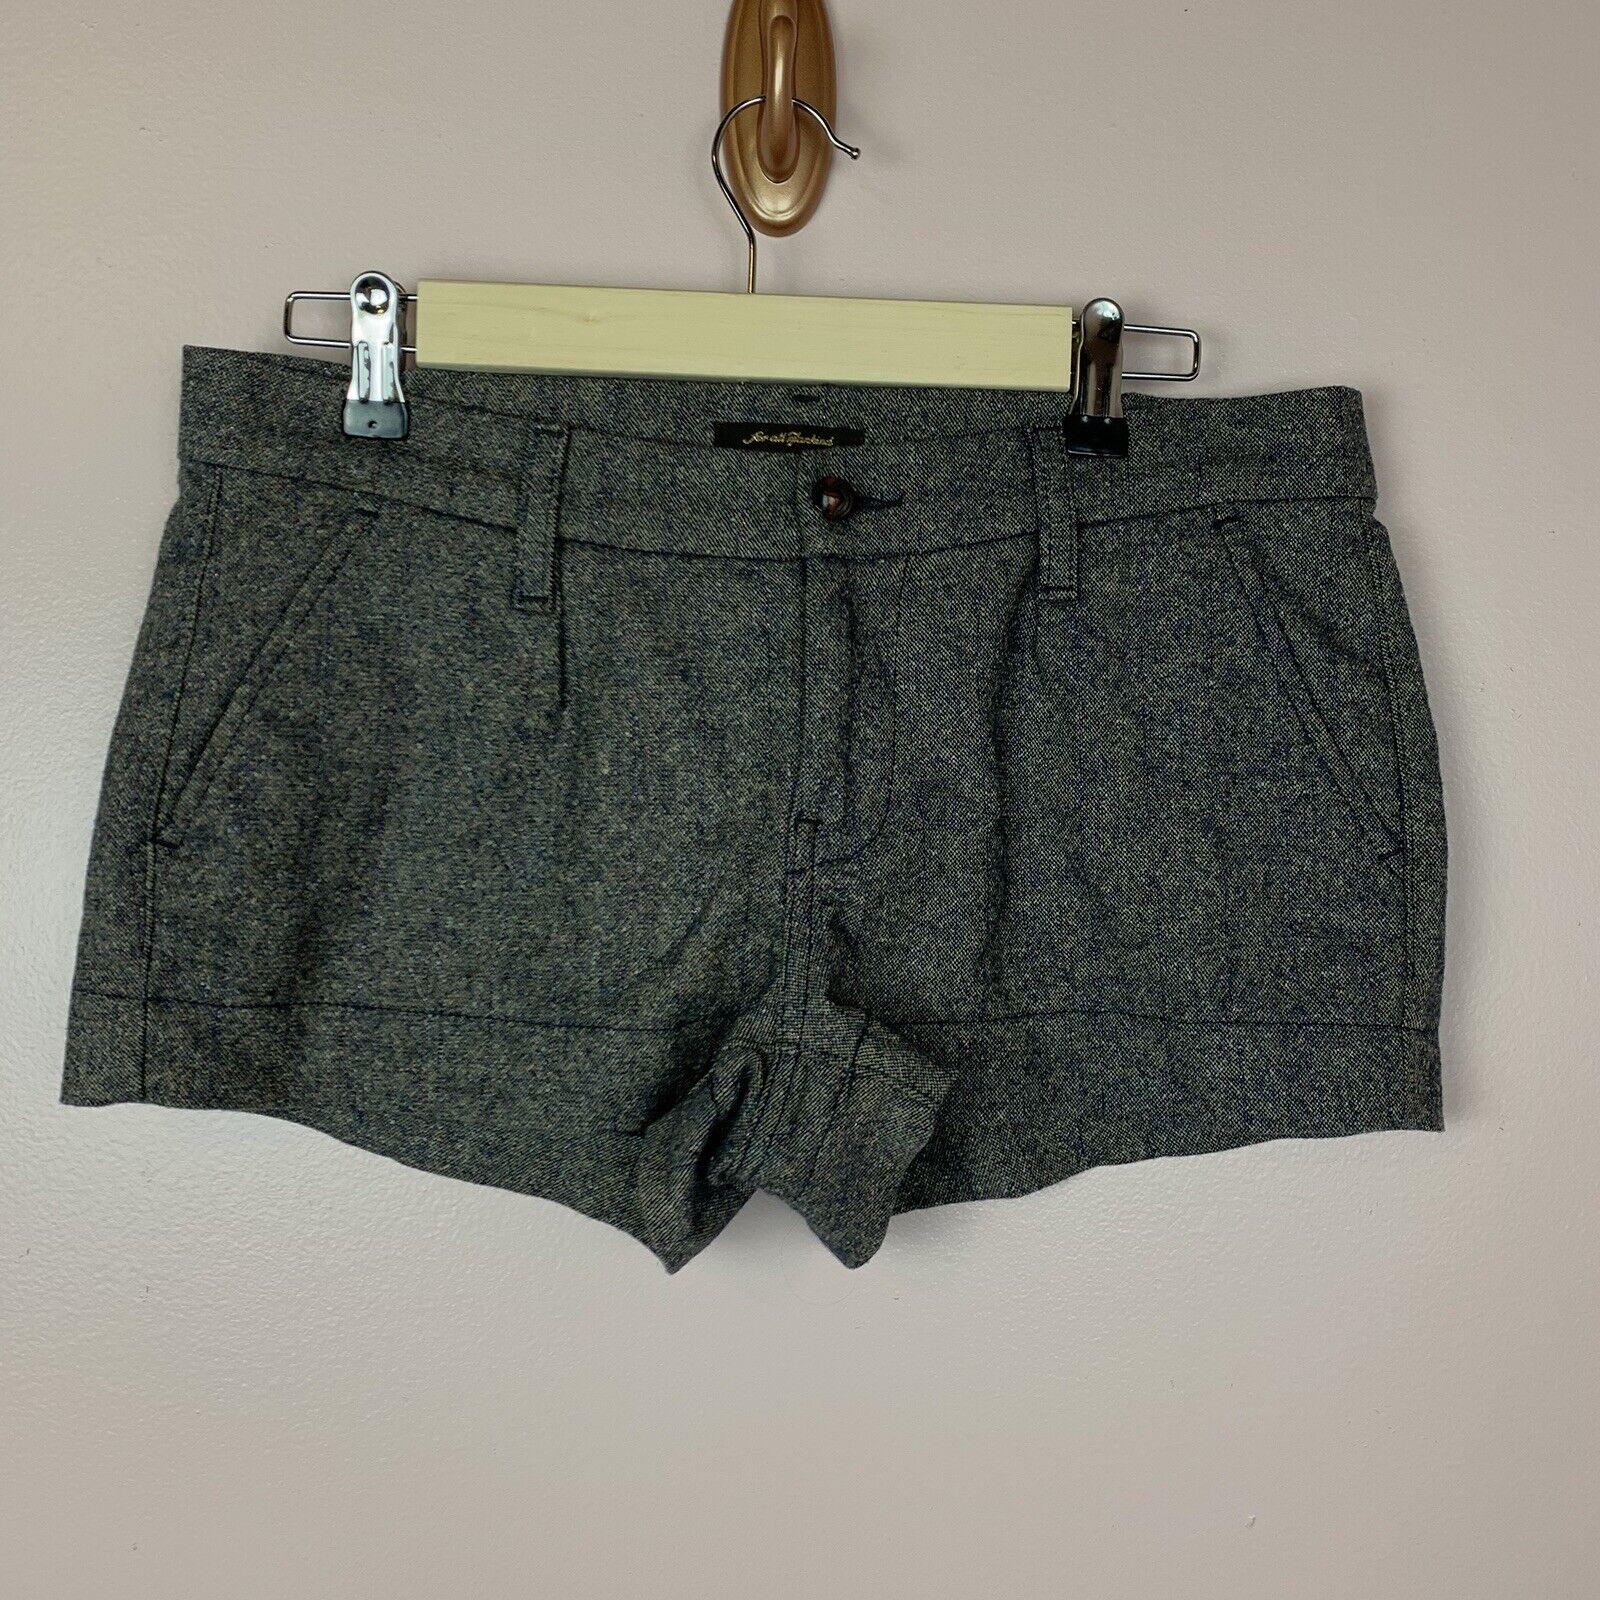 7FAM Women's Tweed Tailored Shorts Virgin Wool Bl… - image 1